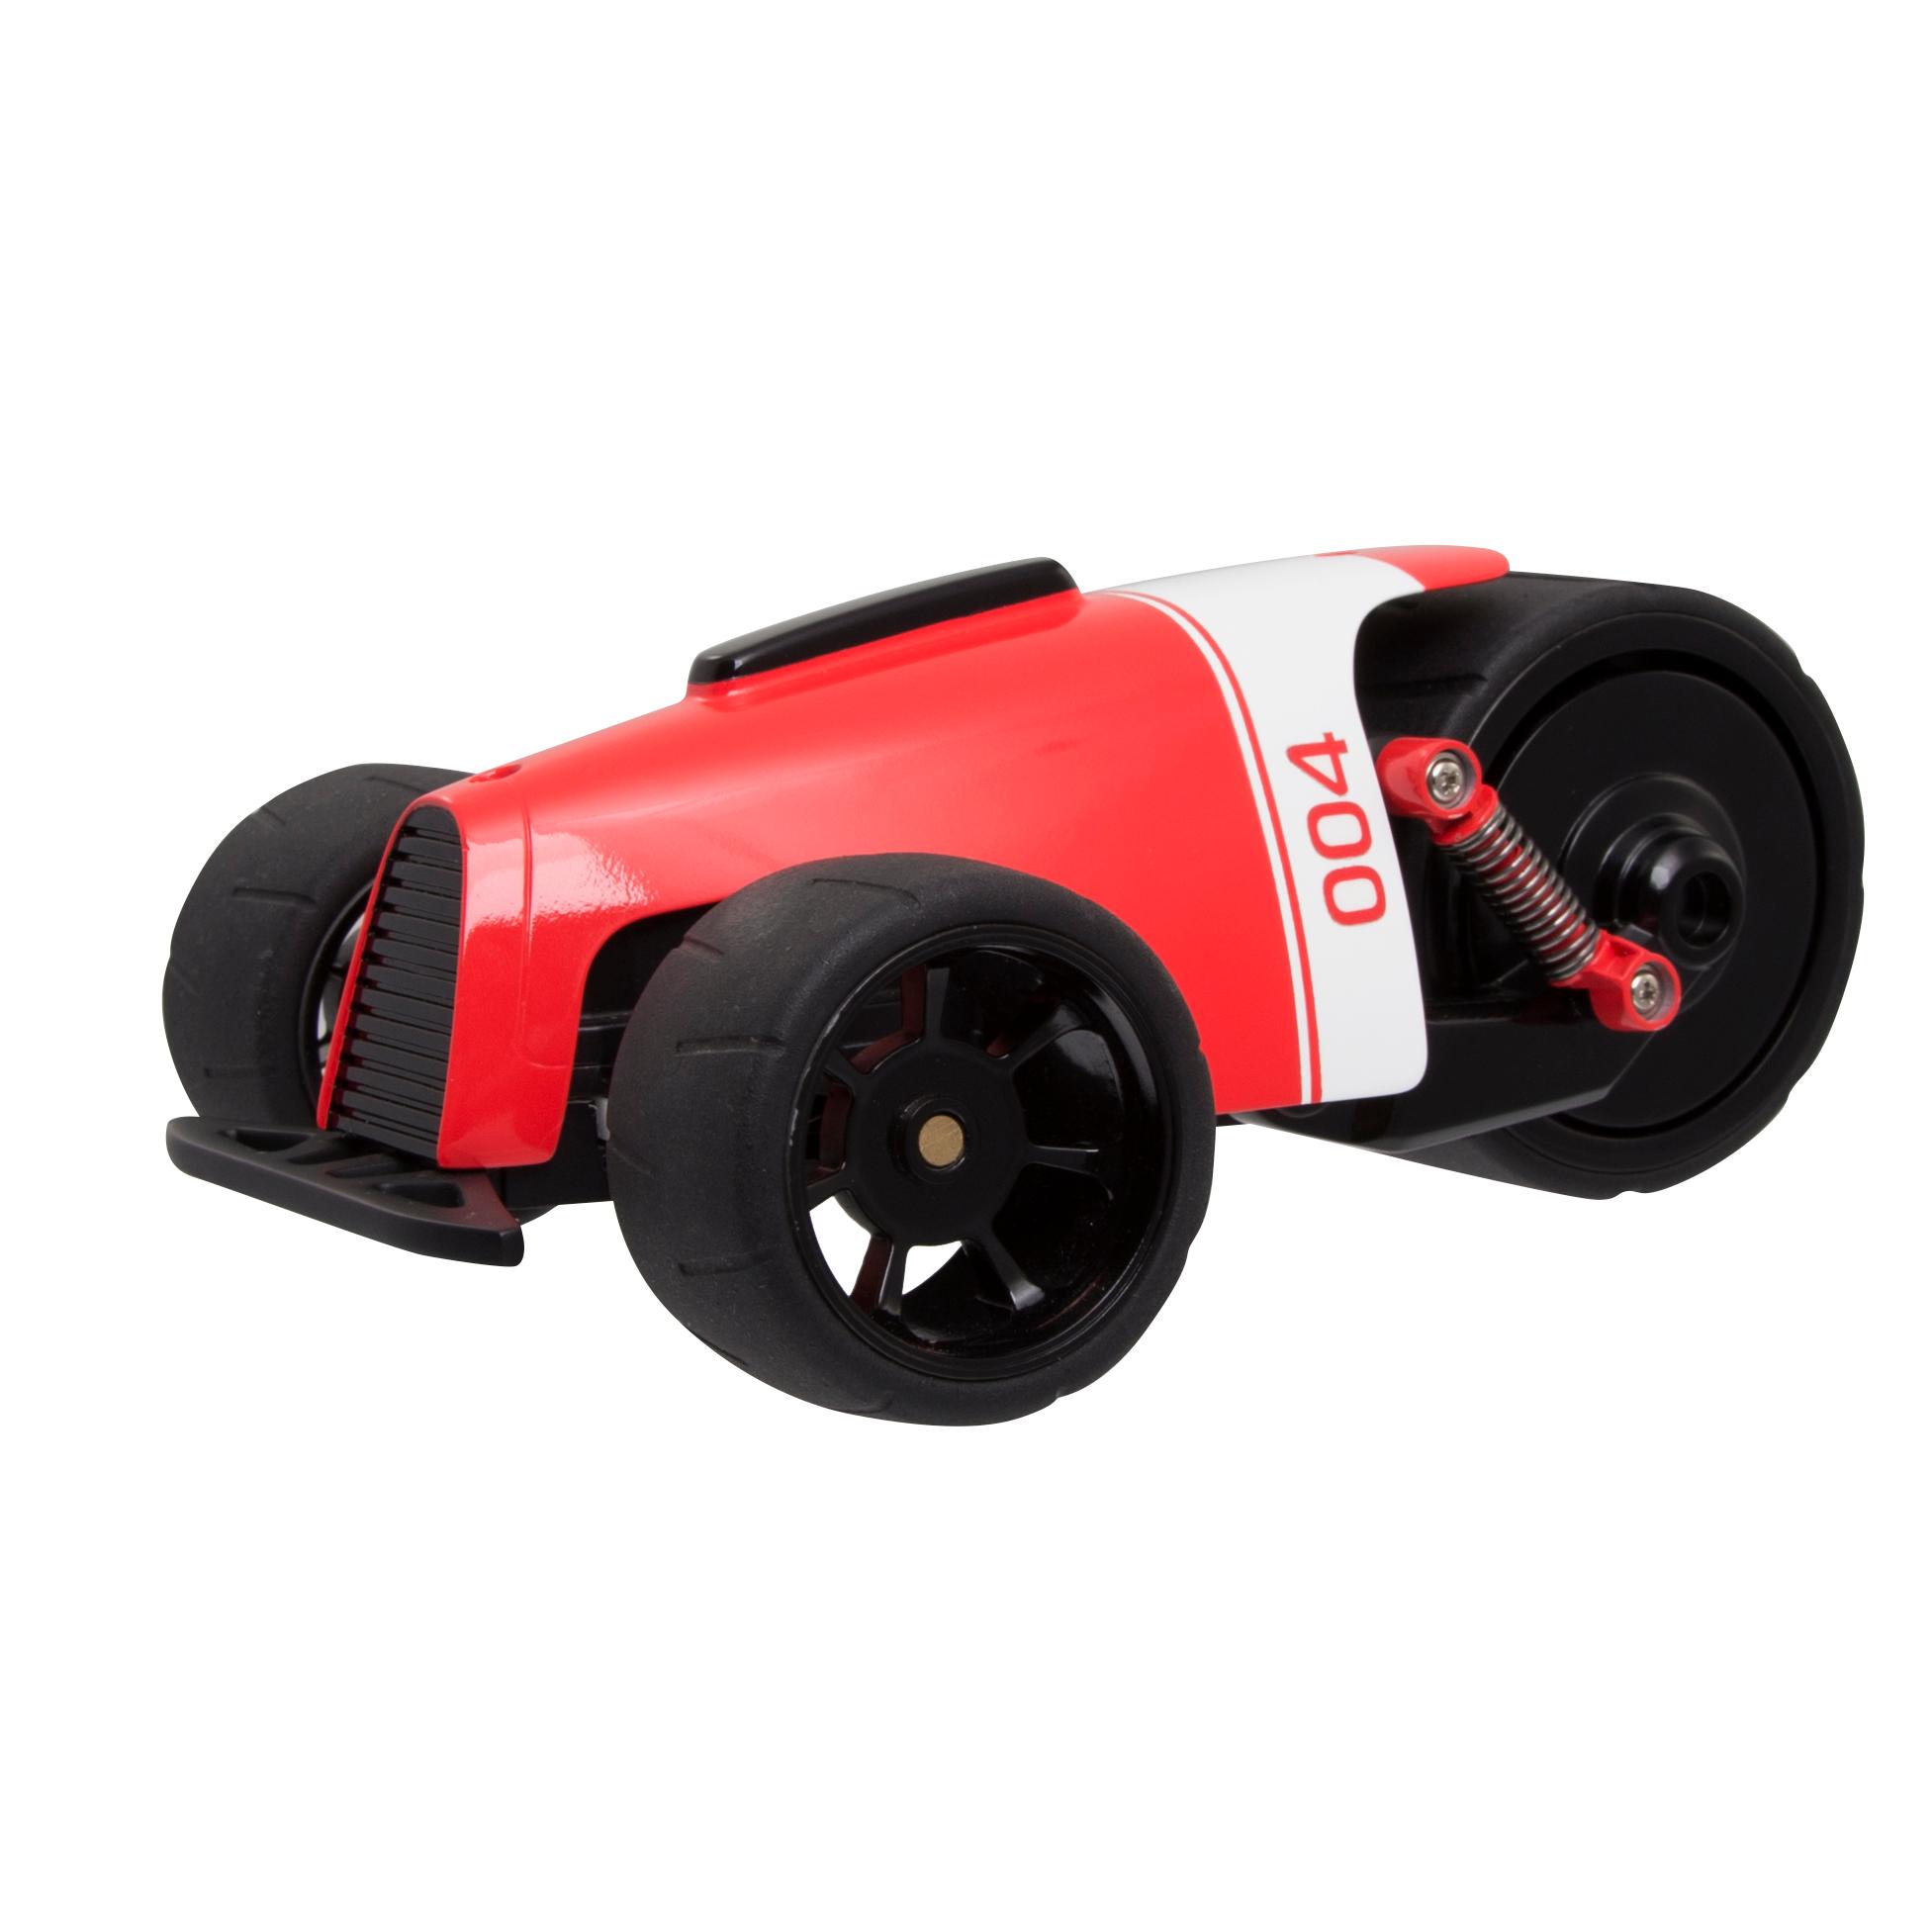 Sharper Image - Phantom Racer Trike - Red 27 MHz (50-00111A)